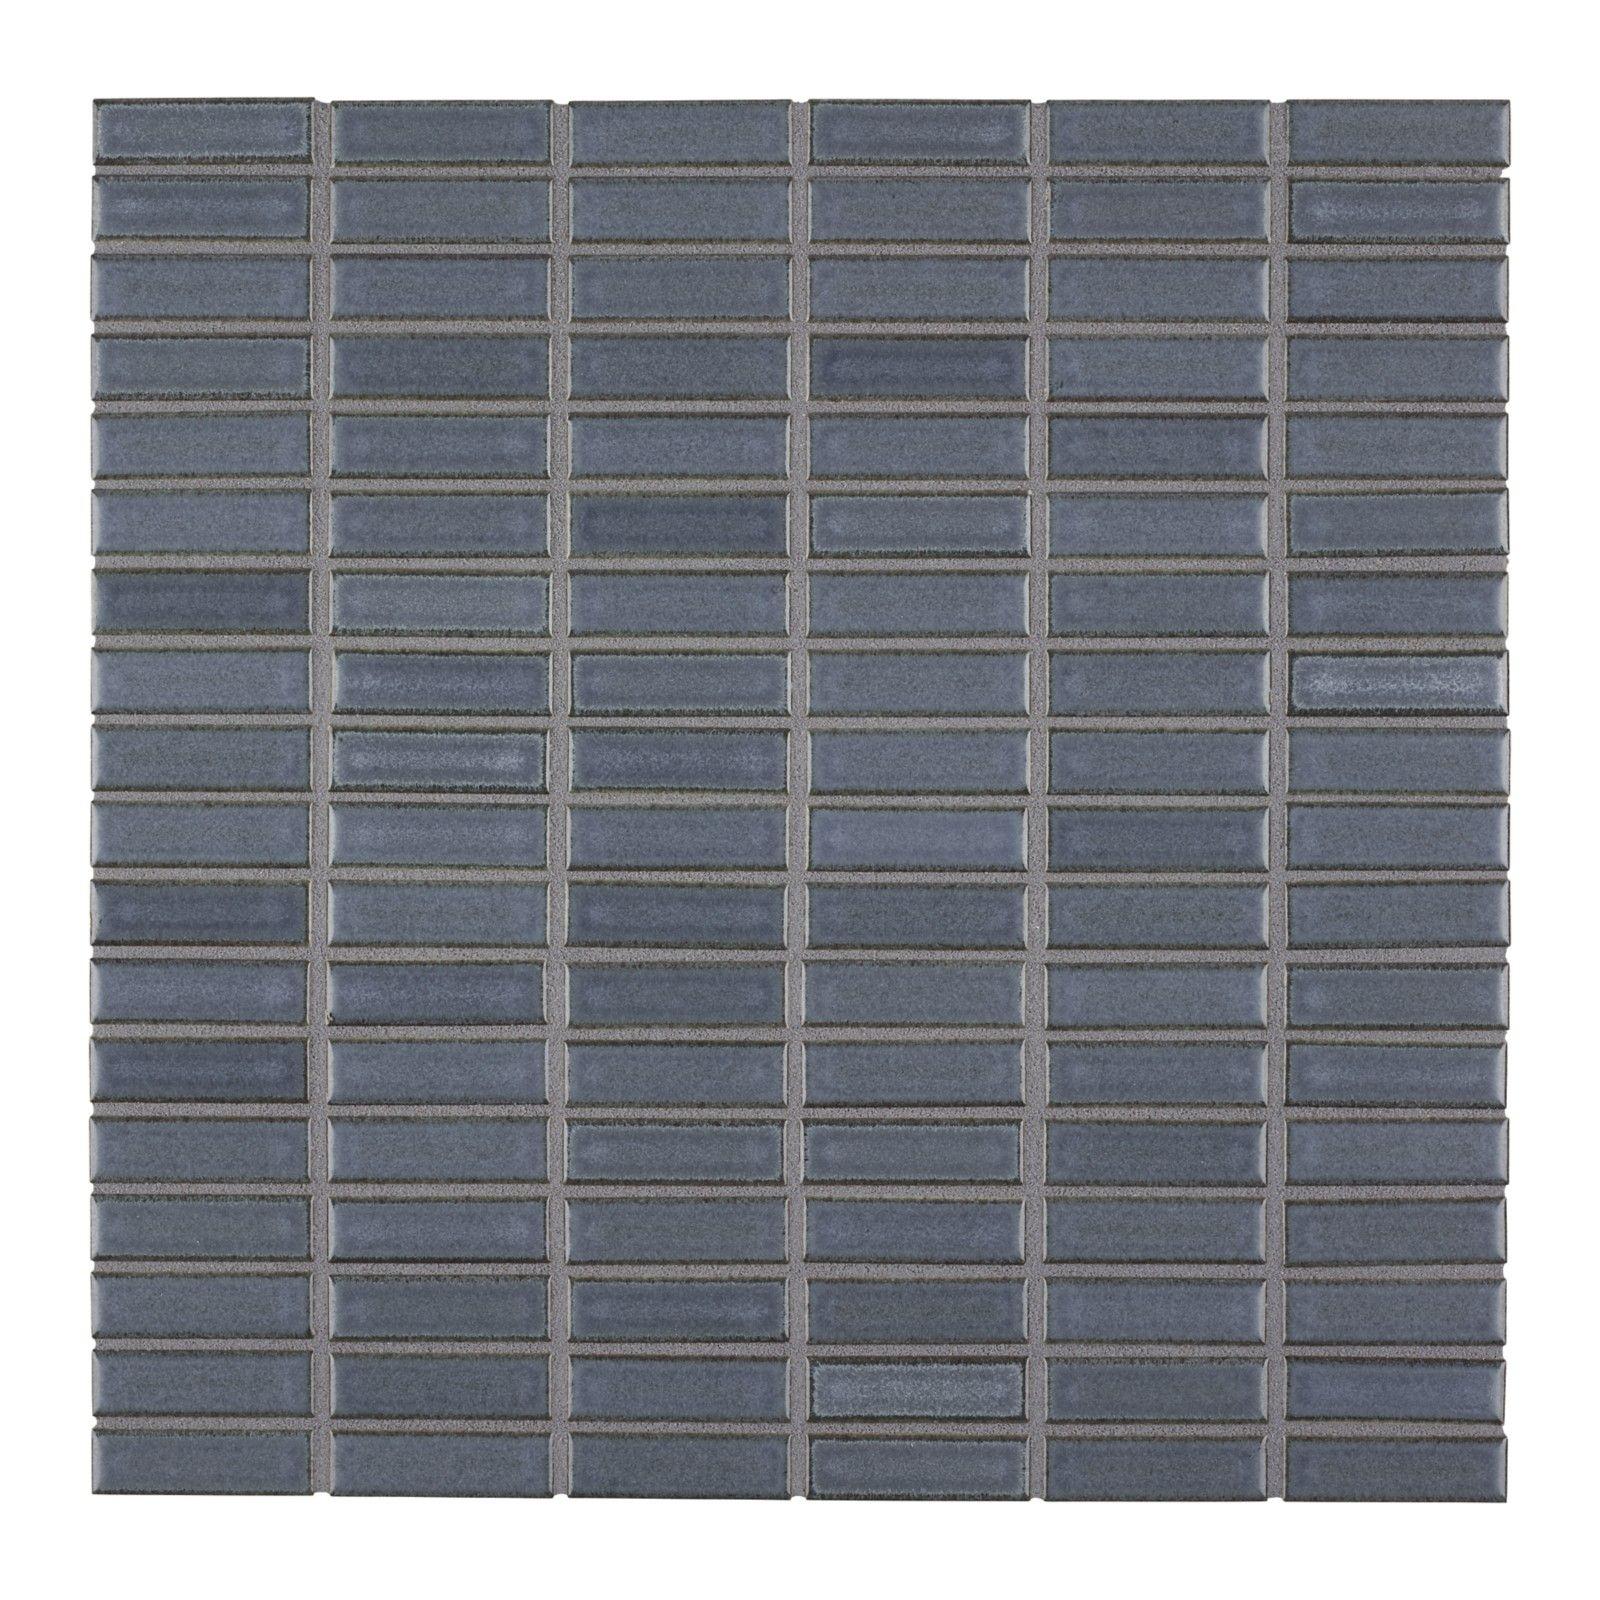 Ann Sacks Mosaic Bathroom Tile: ANN SACKS Tile & Stone - Small Stack